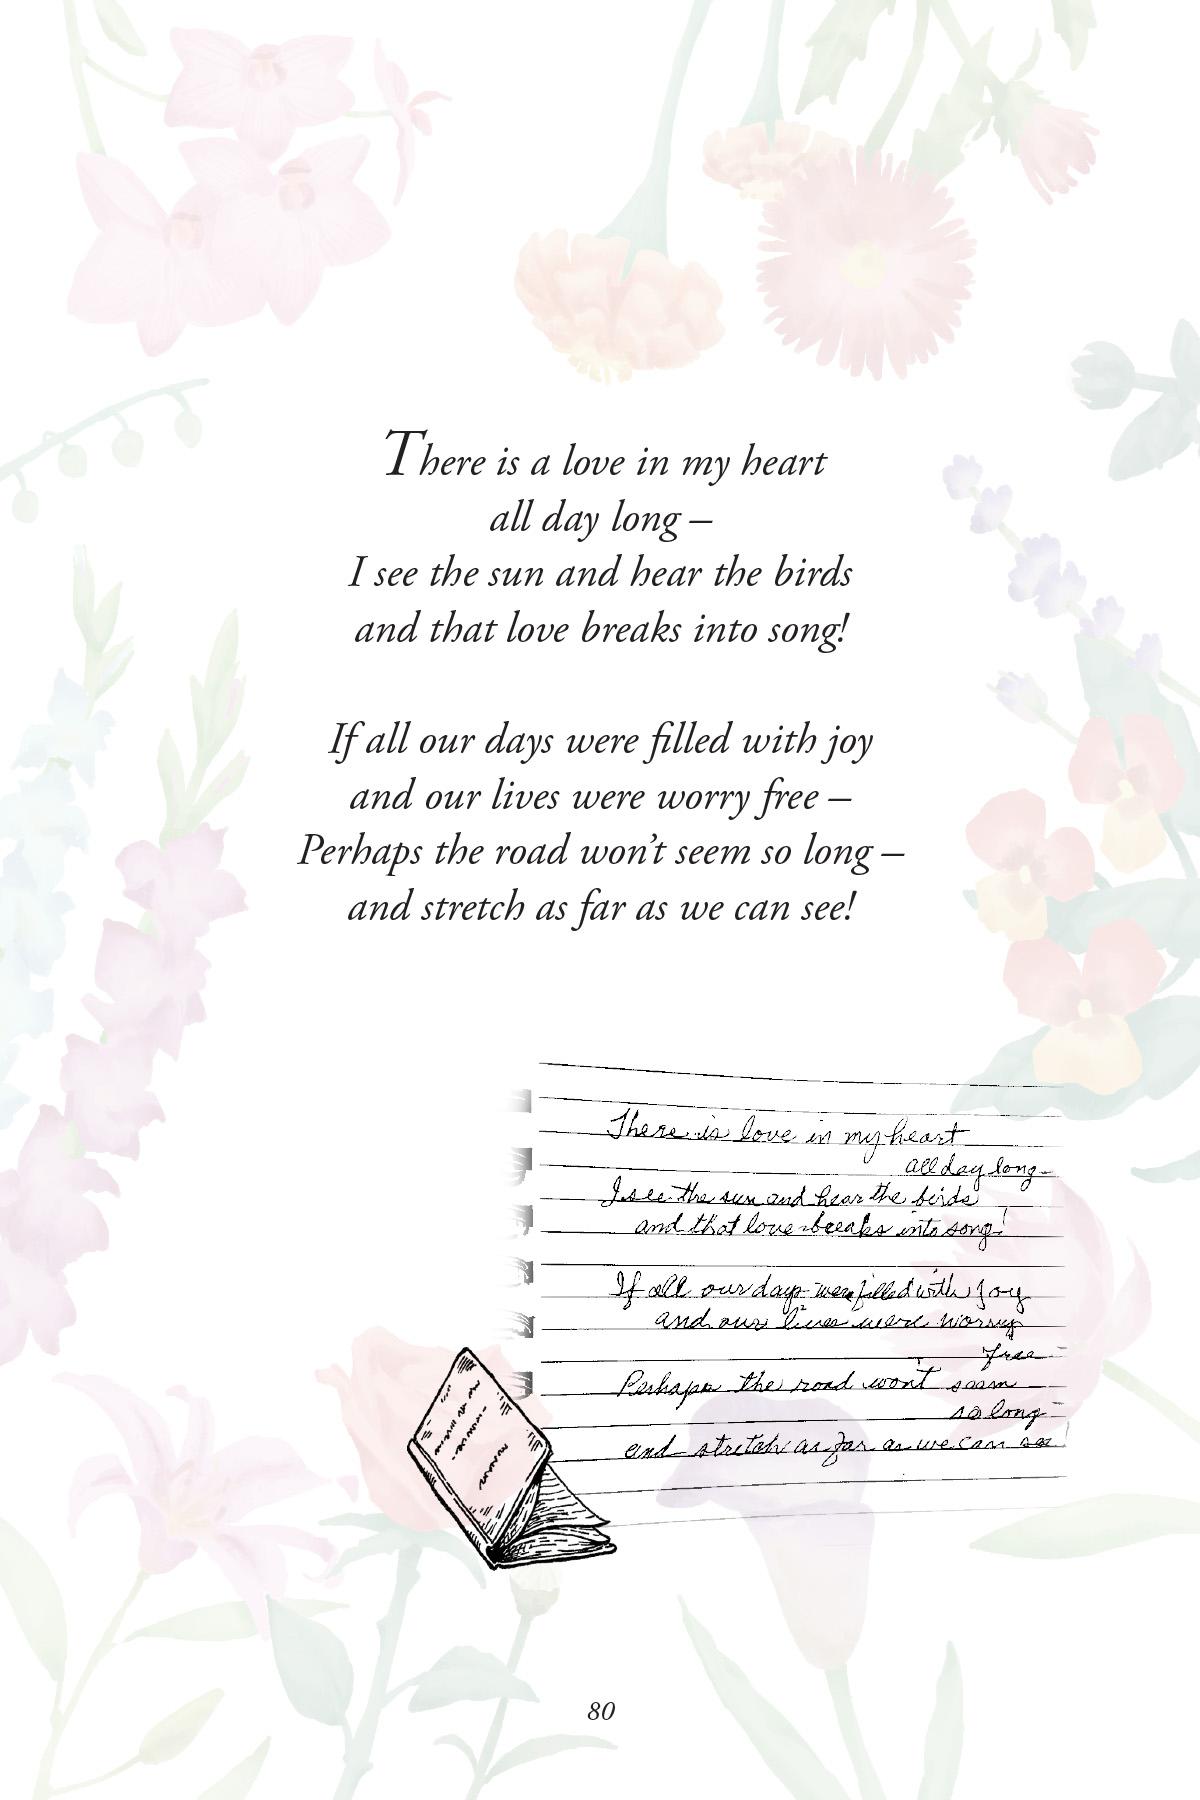 MyLittleBookOfPoetry_Layout_Poem-ThereIsLove-WEB